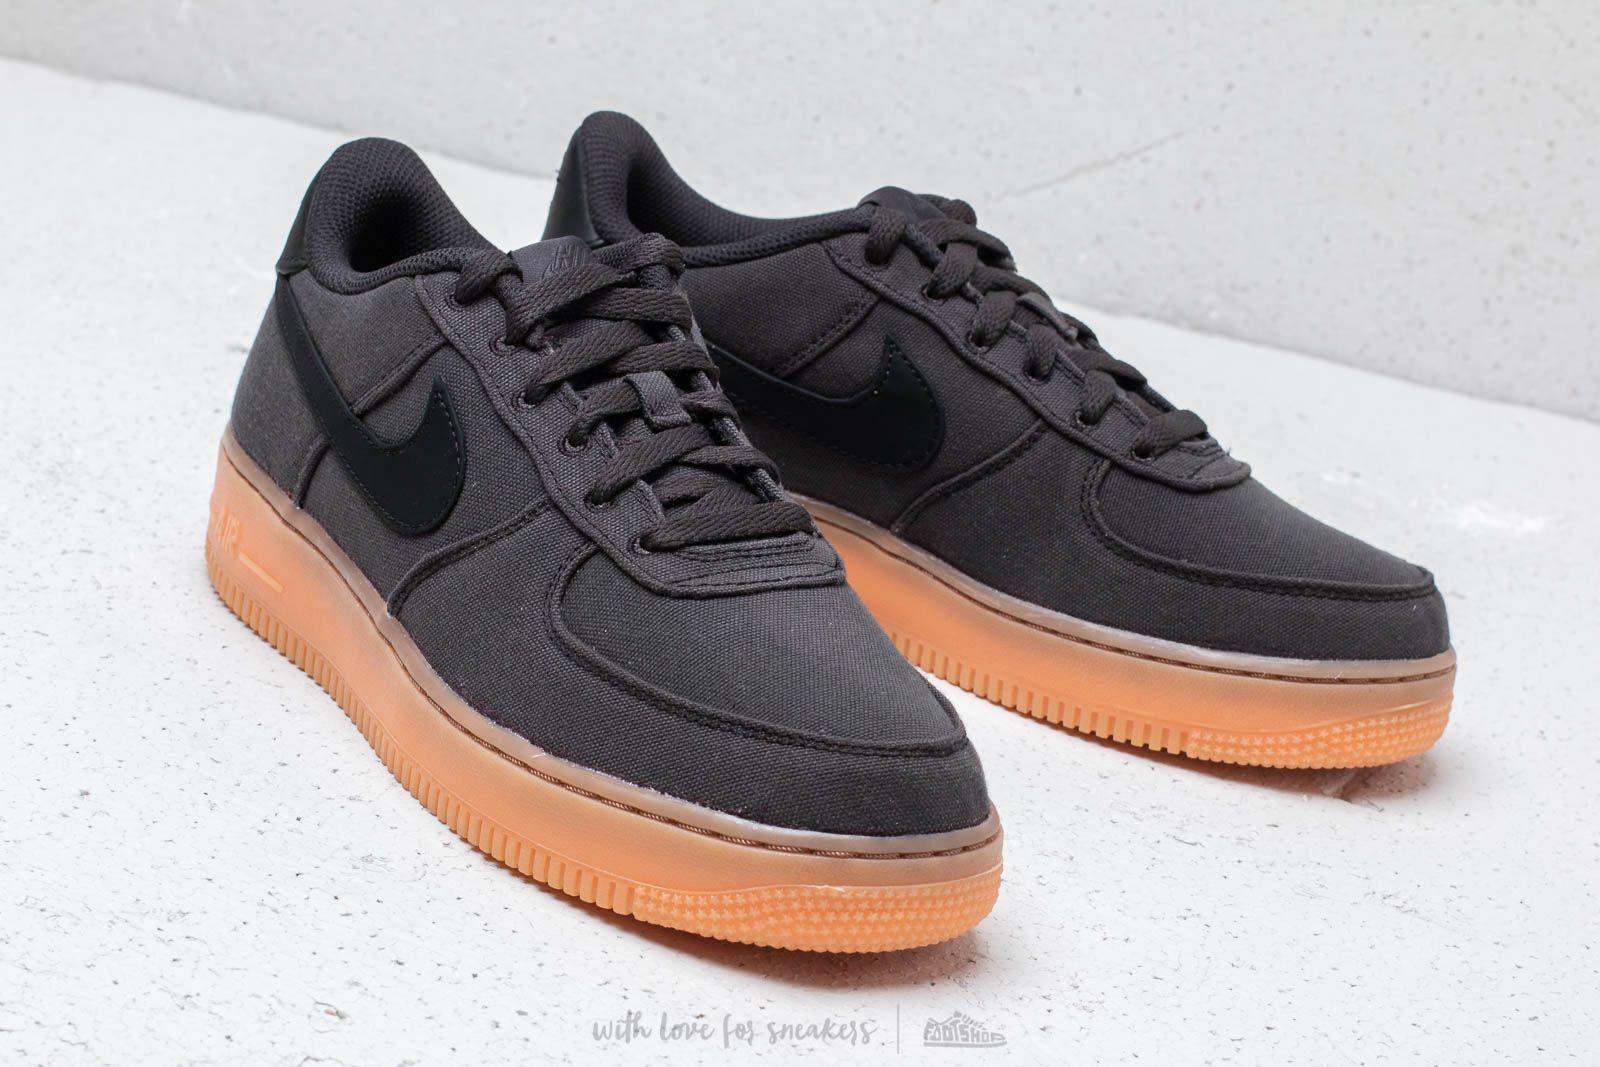 LV8 Style (GS) Black/ Black-Gum Med Brown